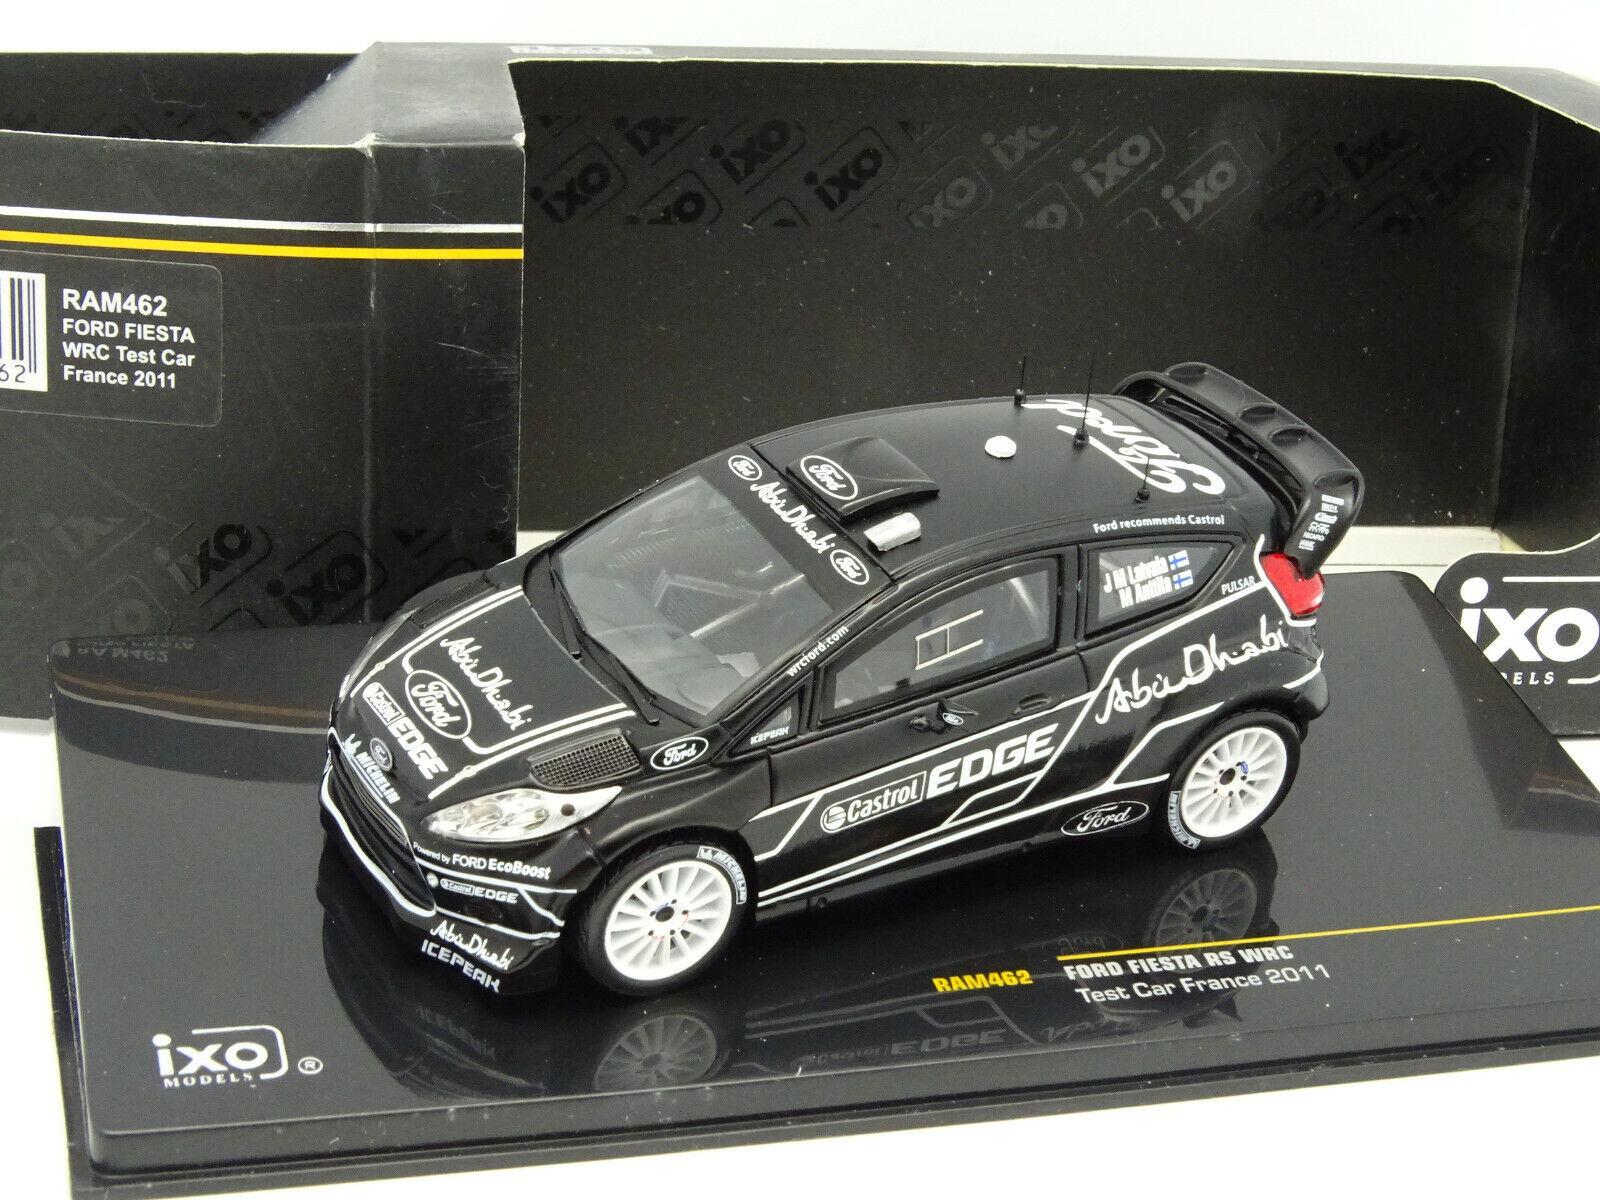 orden ahora con gran descuento y entrega gratuita Ixo 1 43 - Ford Fiesta Rs Rs Rs WRC Test Coche Francia 2011  envio rapido a ti